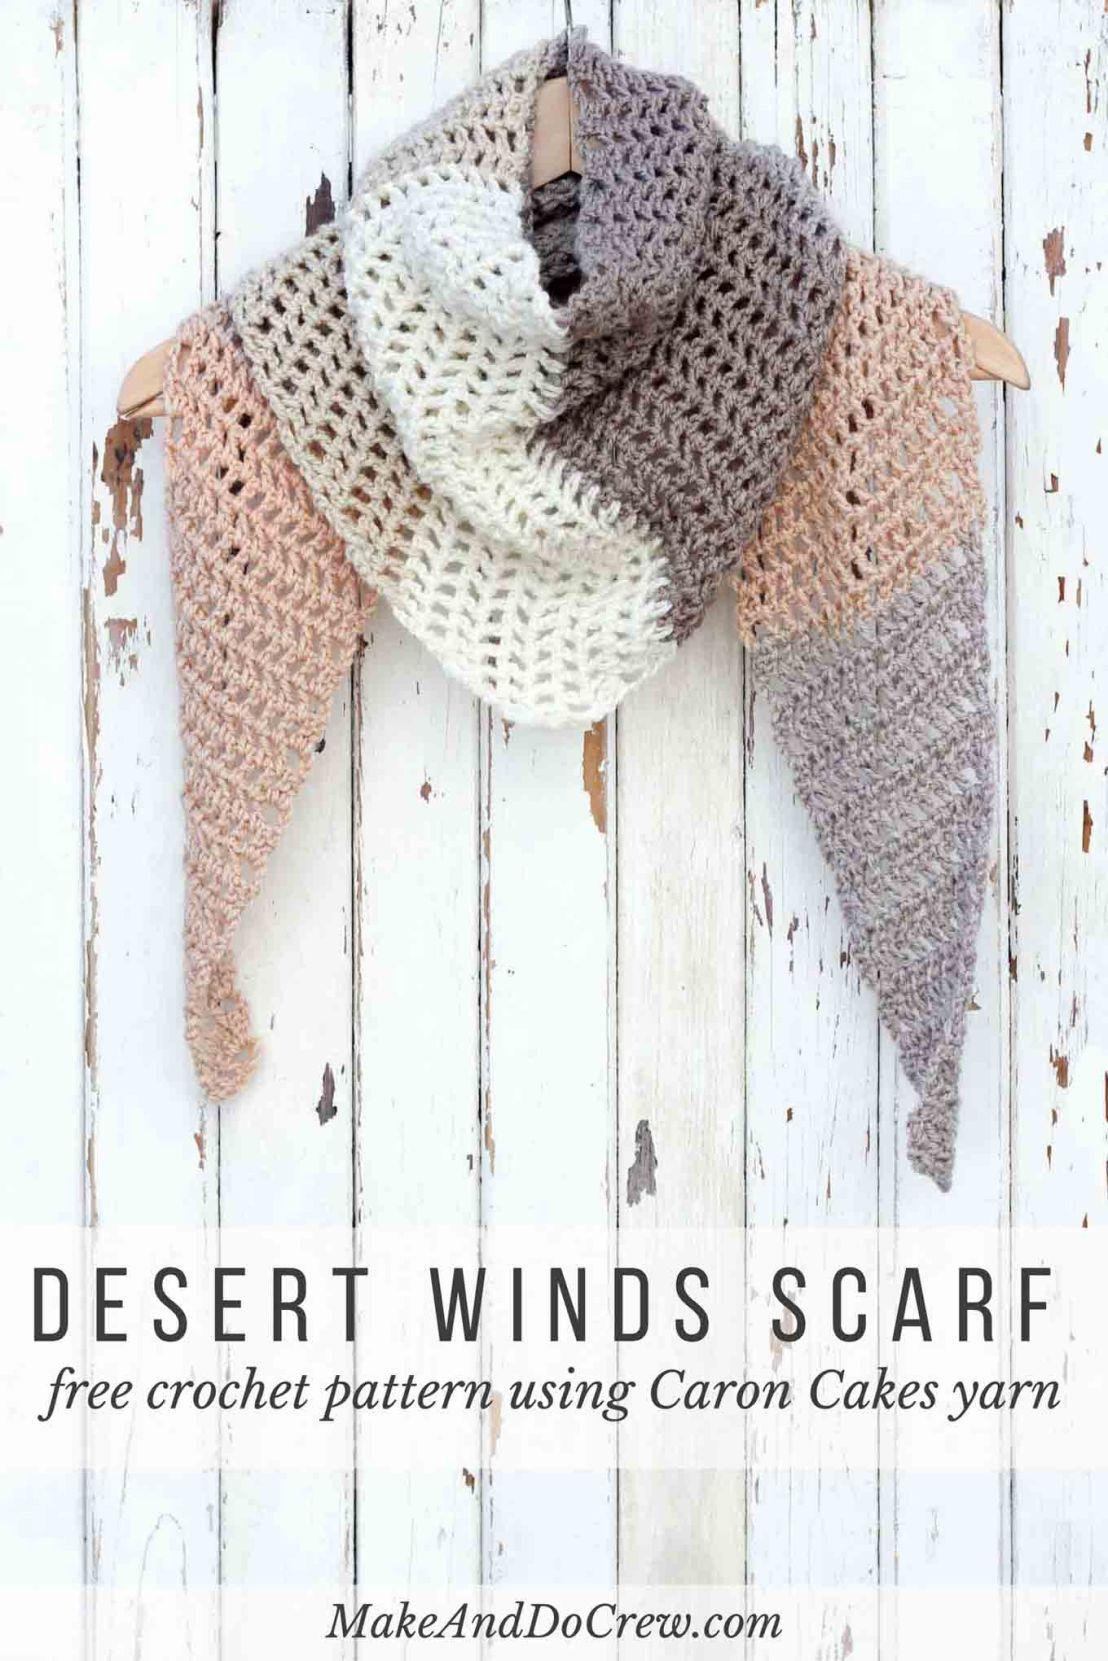 caron-cakes-free-crochet-scarf-pattern